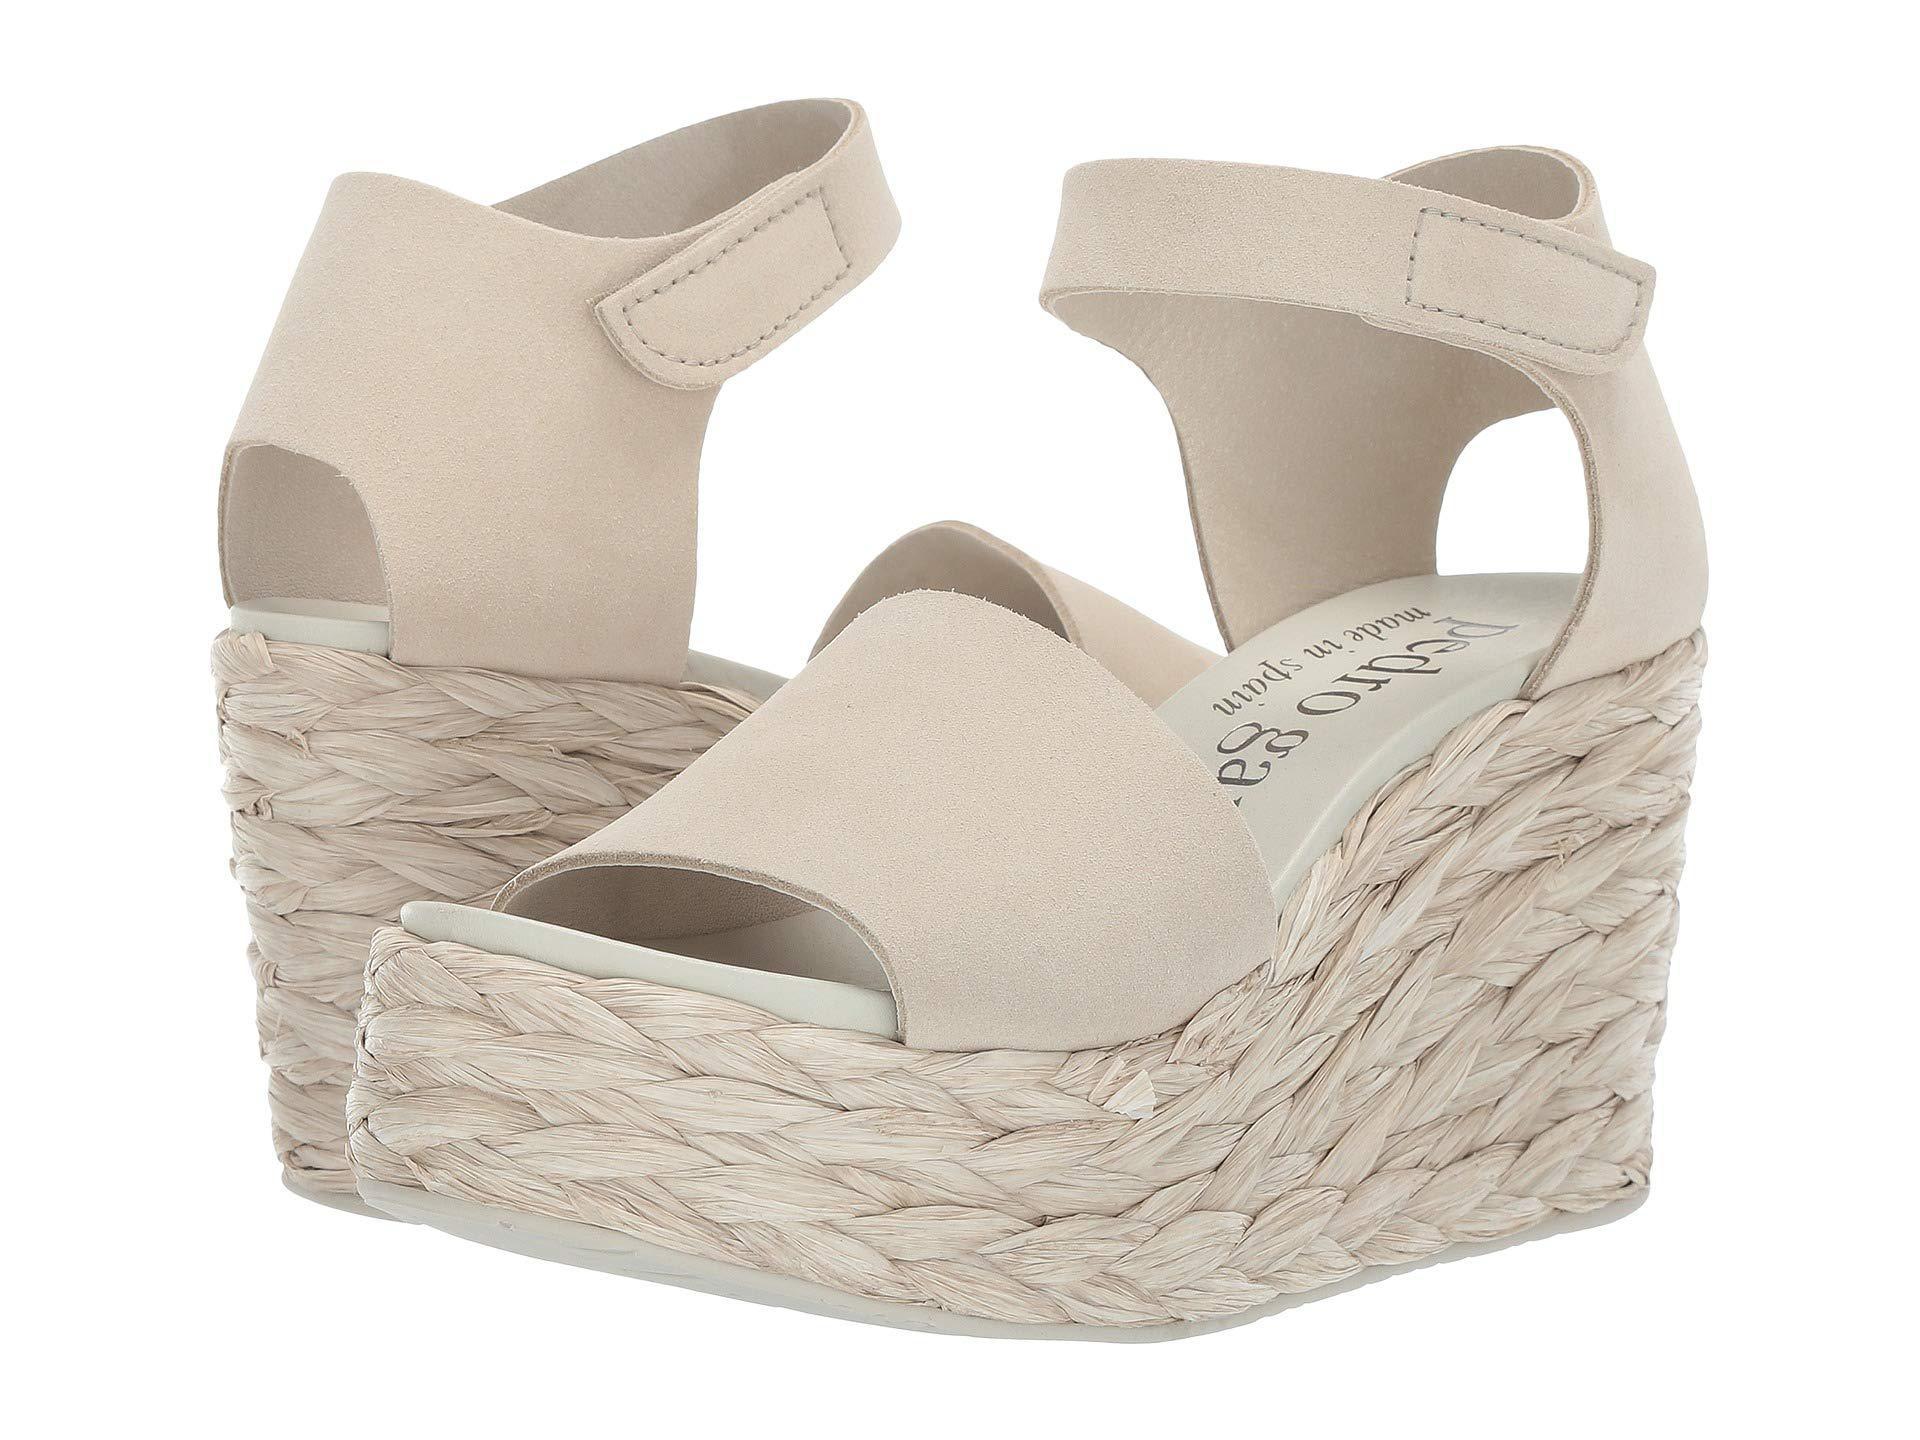 a3f23ca1752 Lyst - Pedro Garcia Dory (nacre Castoro) Women s Shoes